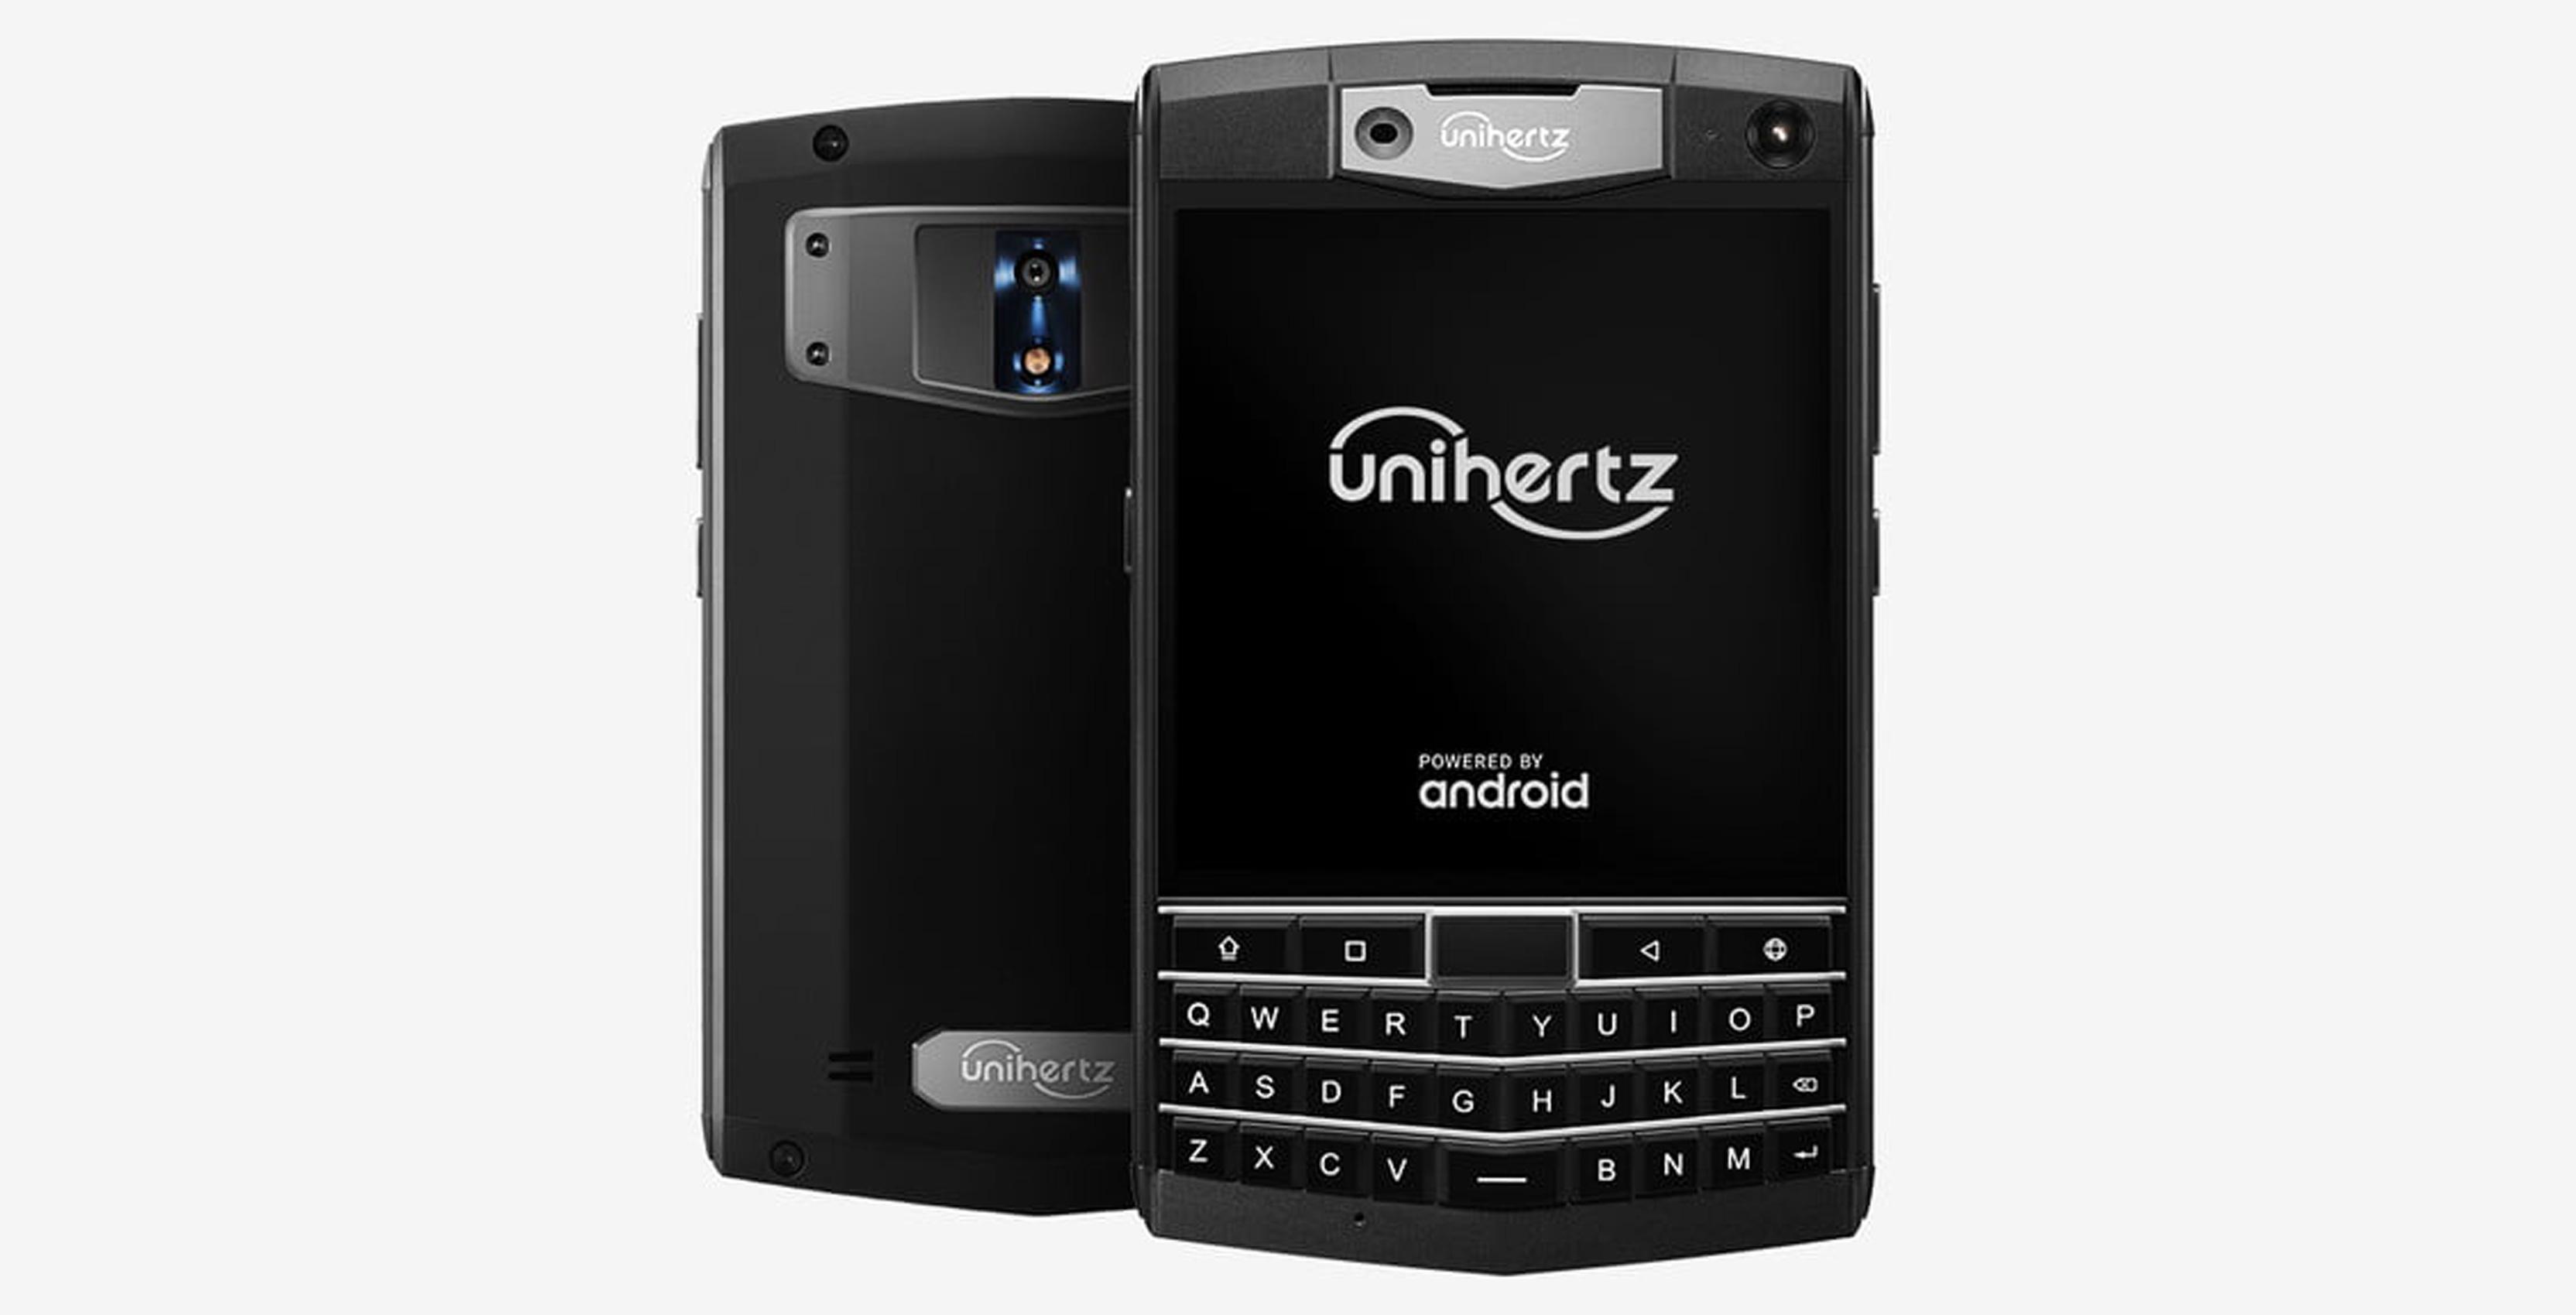 Miss BlackBerry? Here's the Unihertz Titan